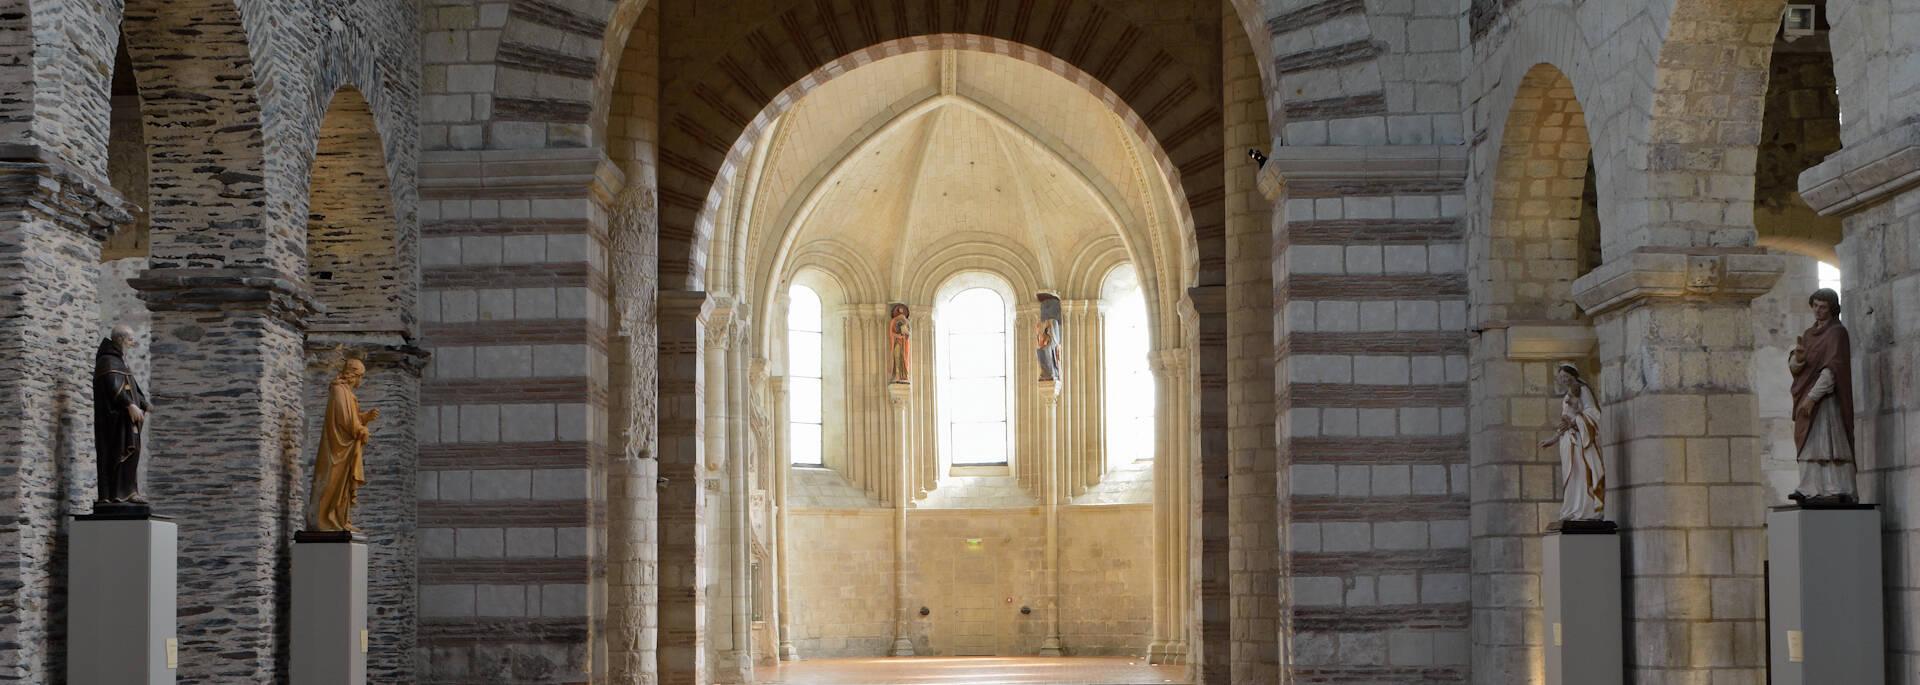 Collégiale Saint-Martin, a Carolingian monument © JP Campion